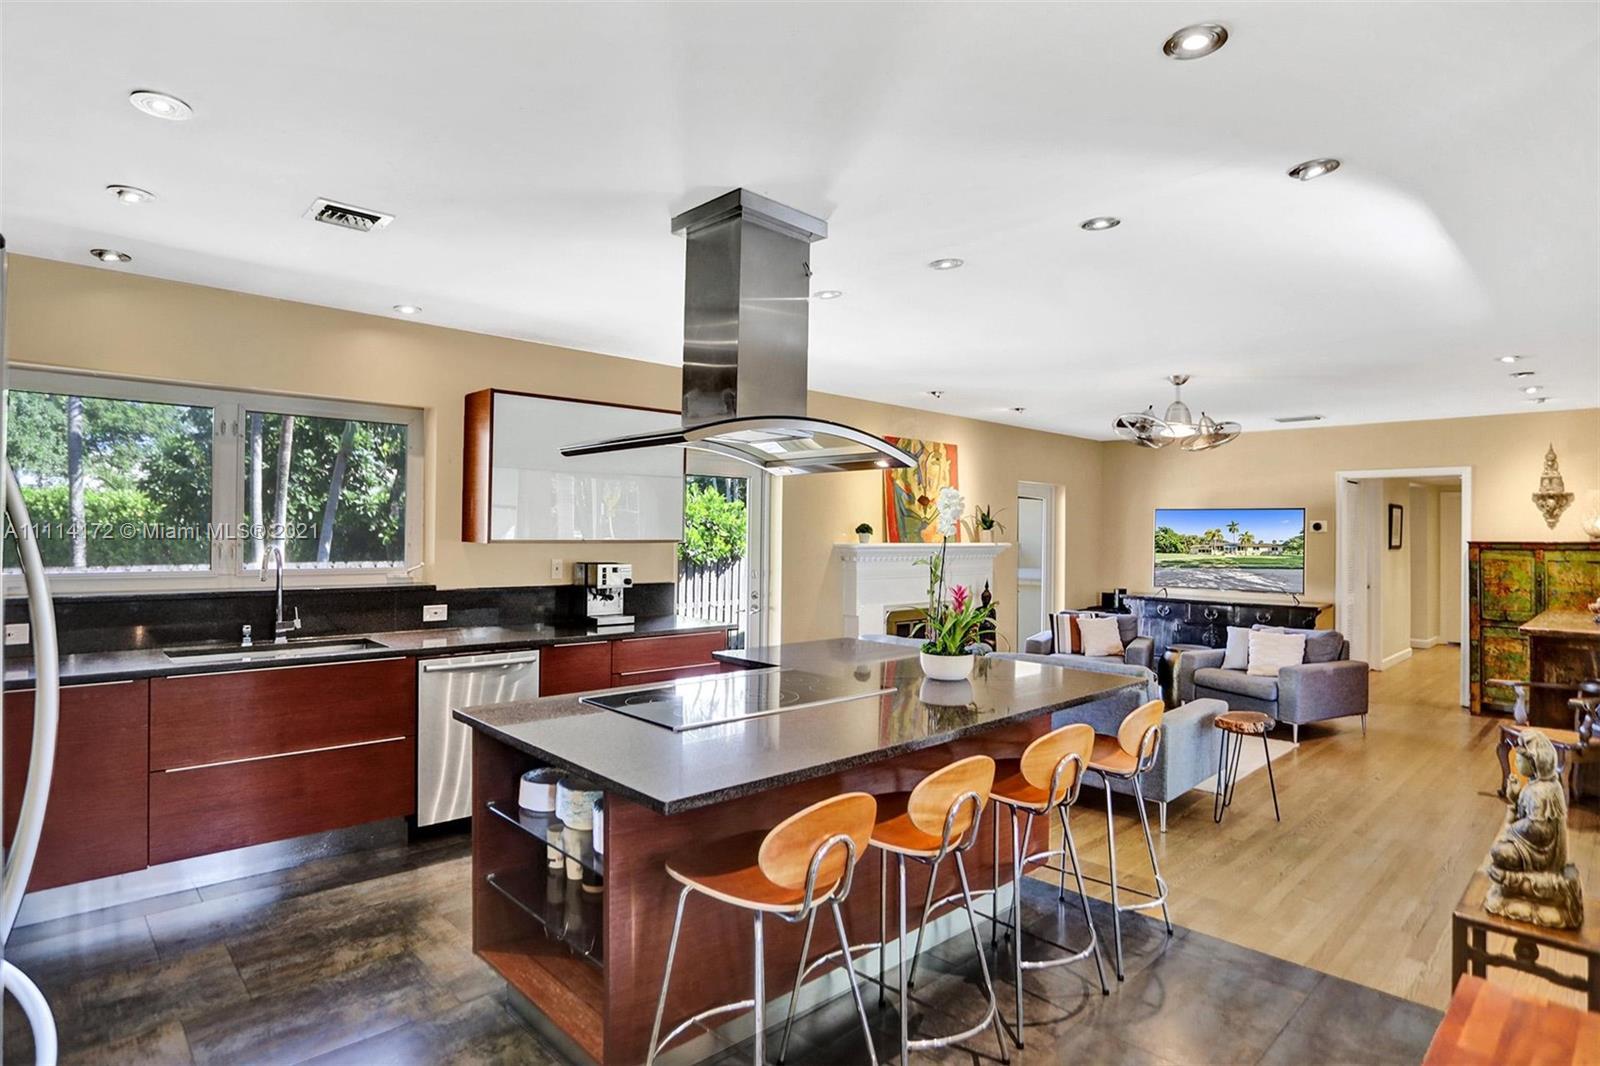 Single Family Home For Sale BISCAYNE PARK KINGS RESUB2,425 Sqft